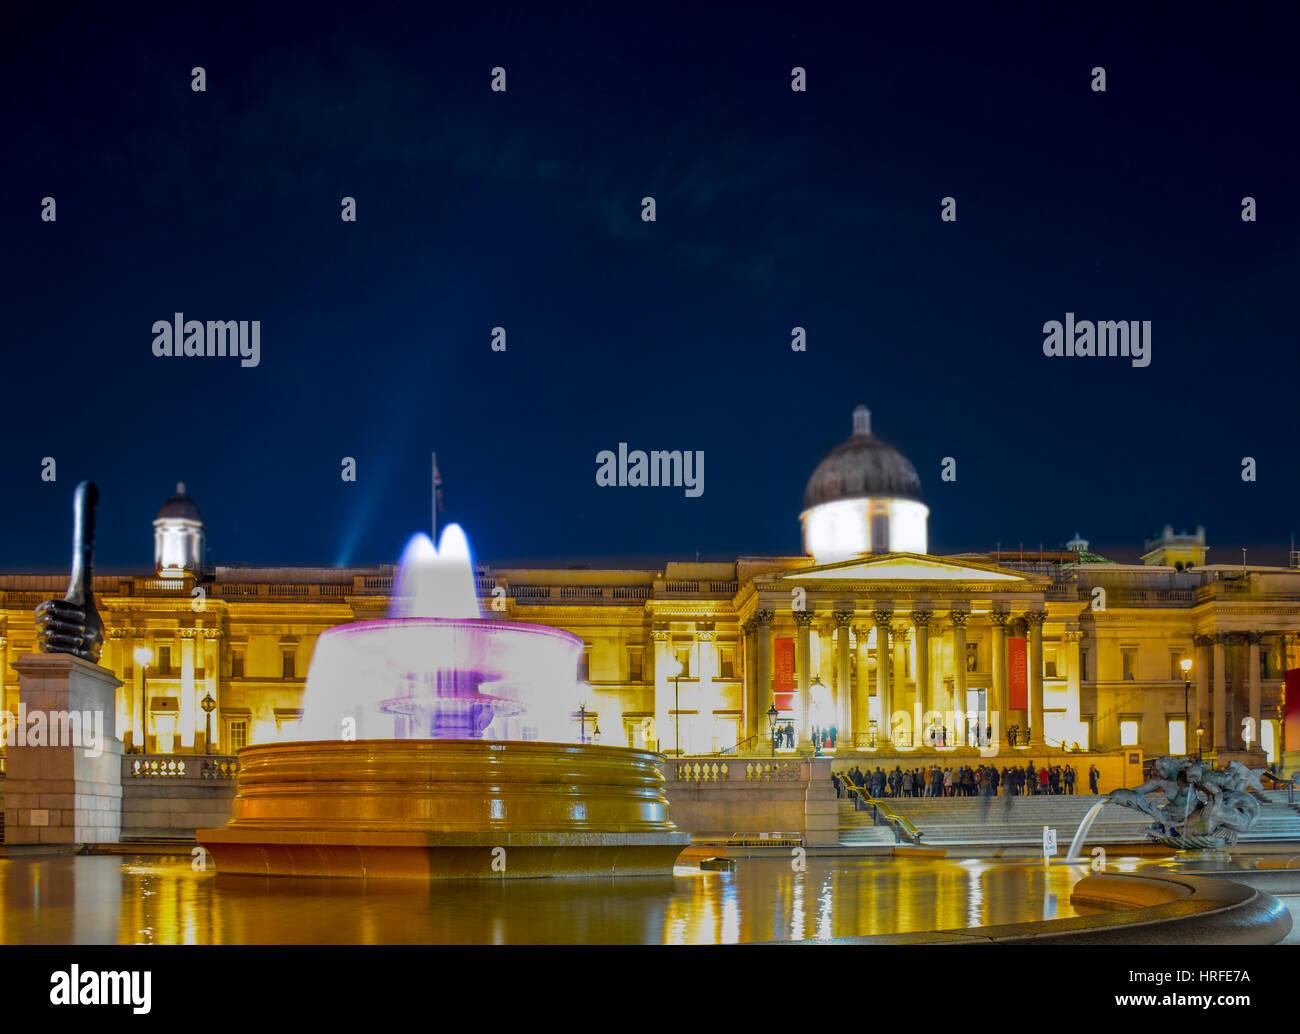 London life - Stock Image